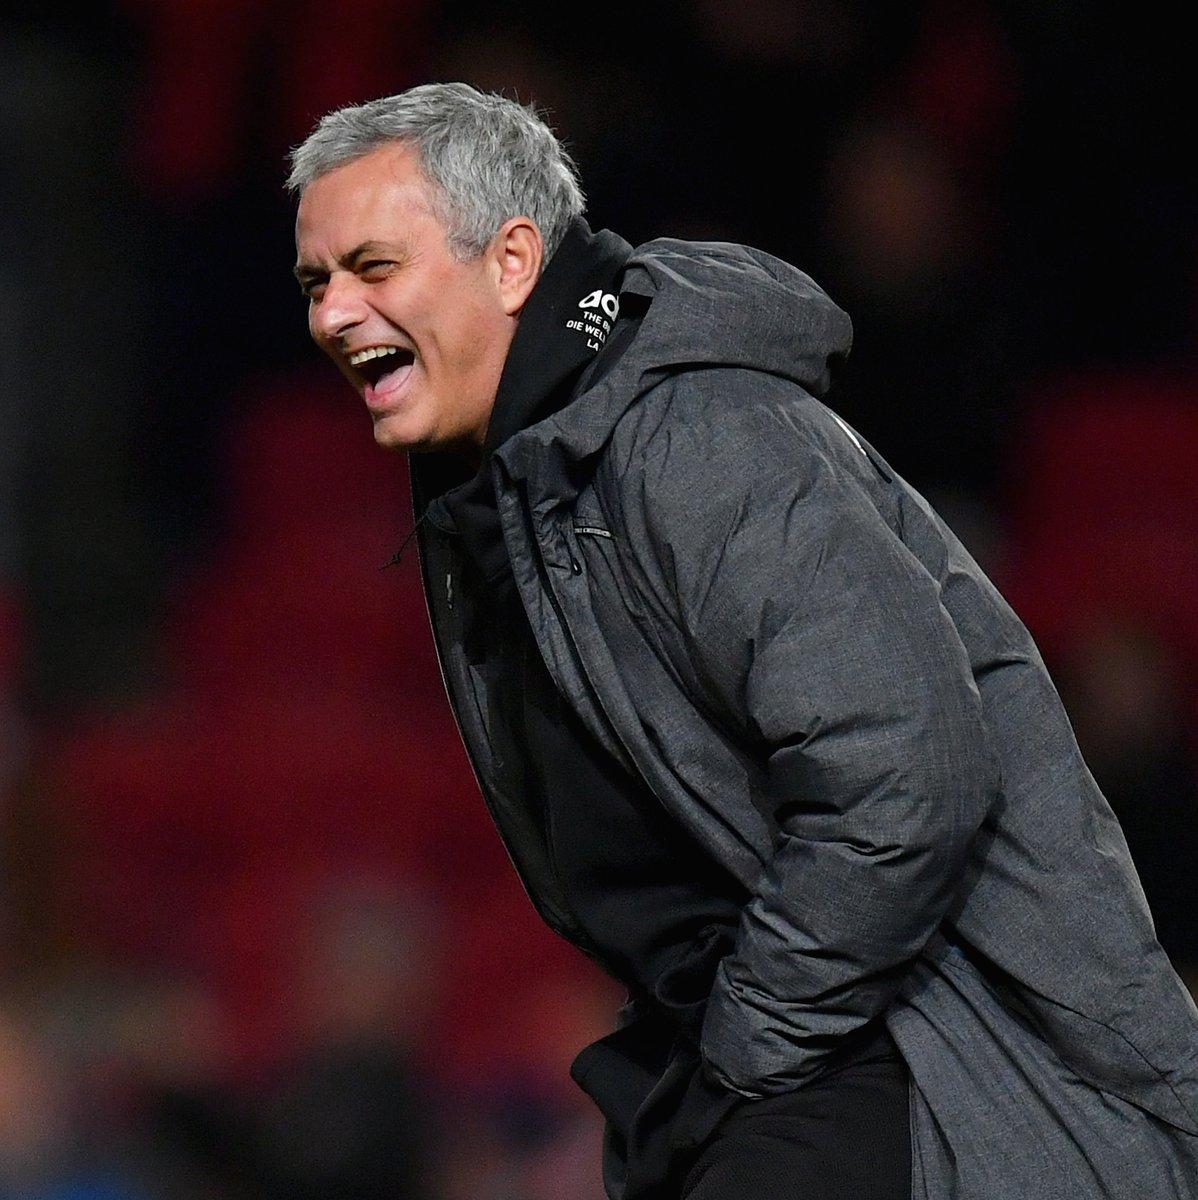 Jose Mourinho joins Roman as Coach